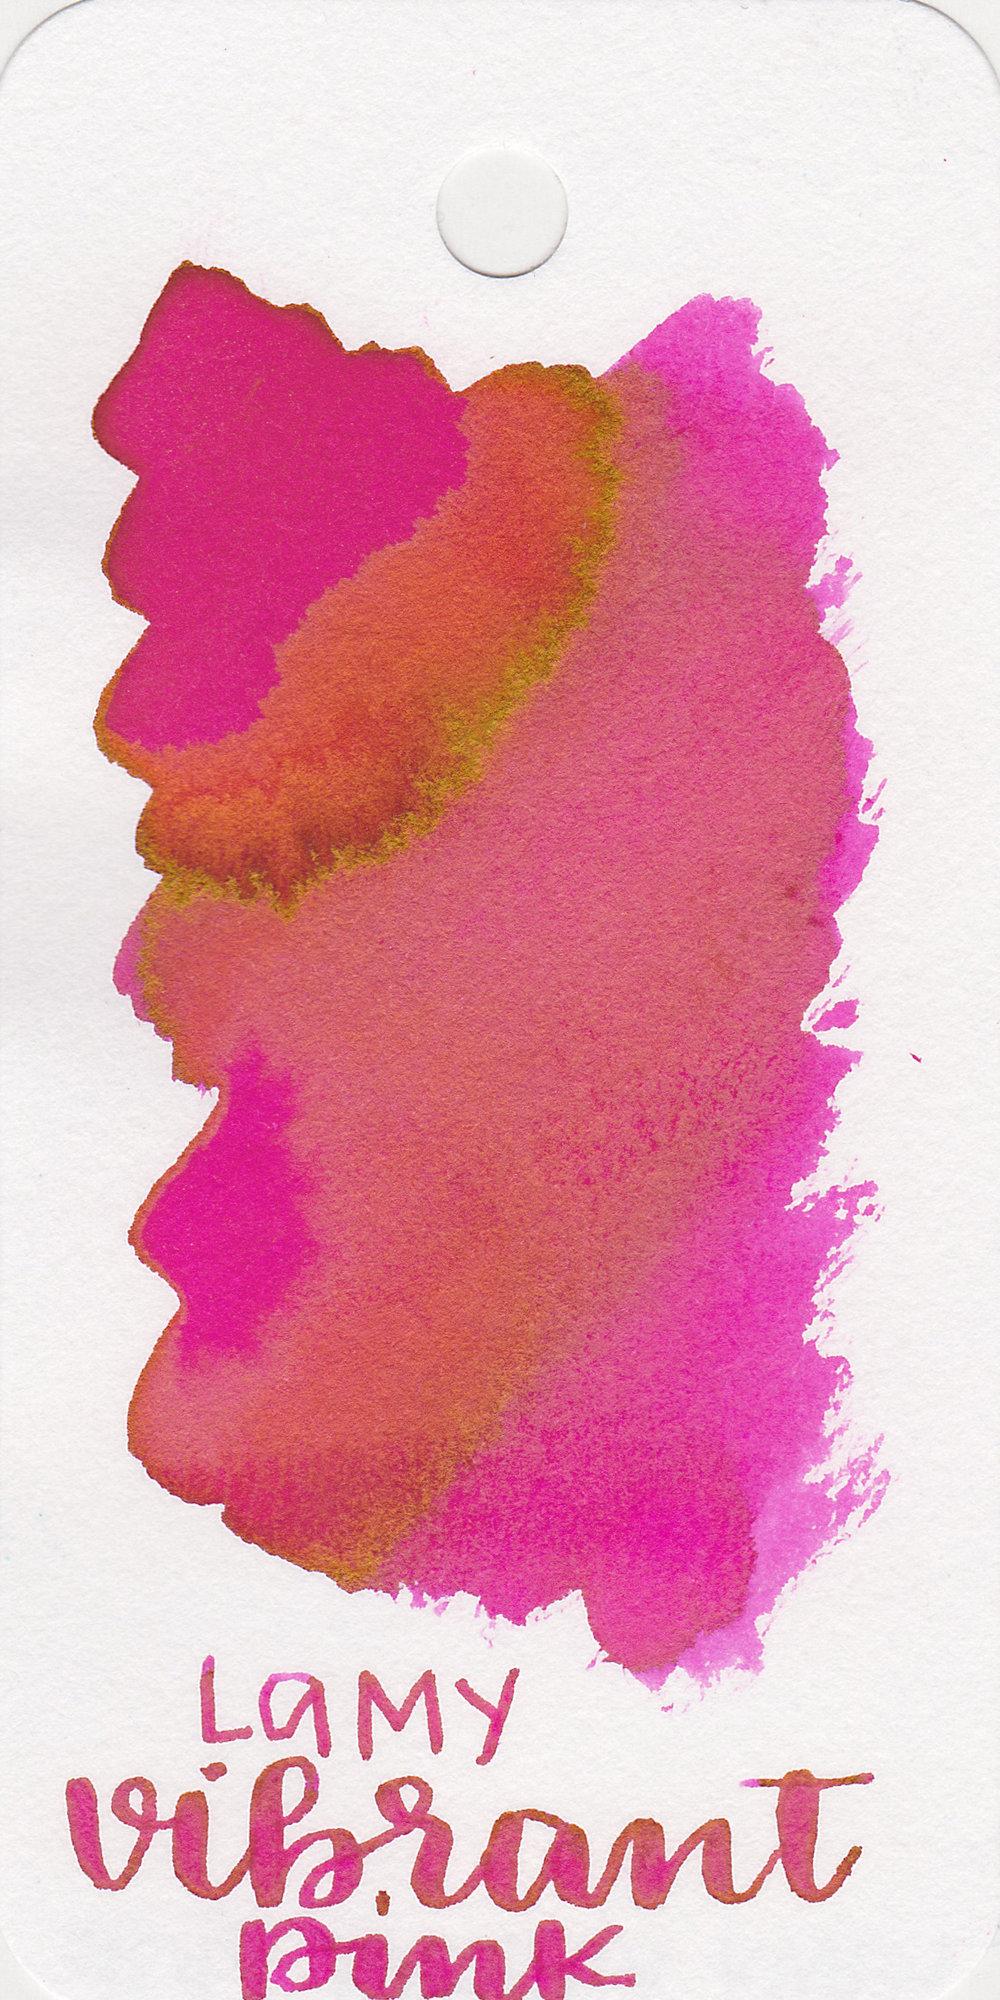 lamy-vibrant-pink-1.jpg